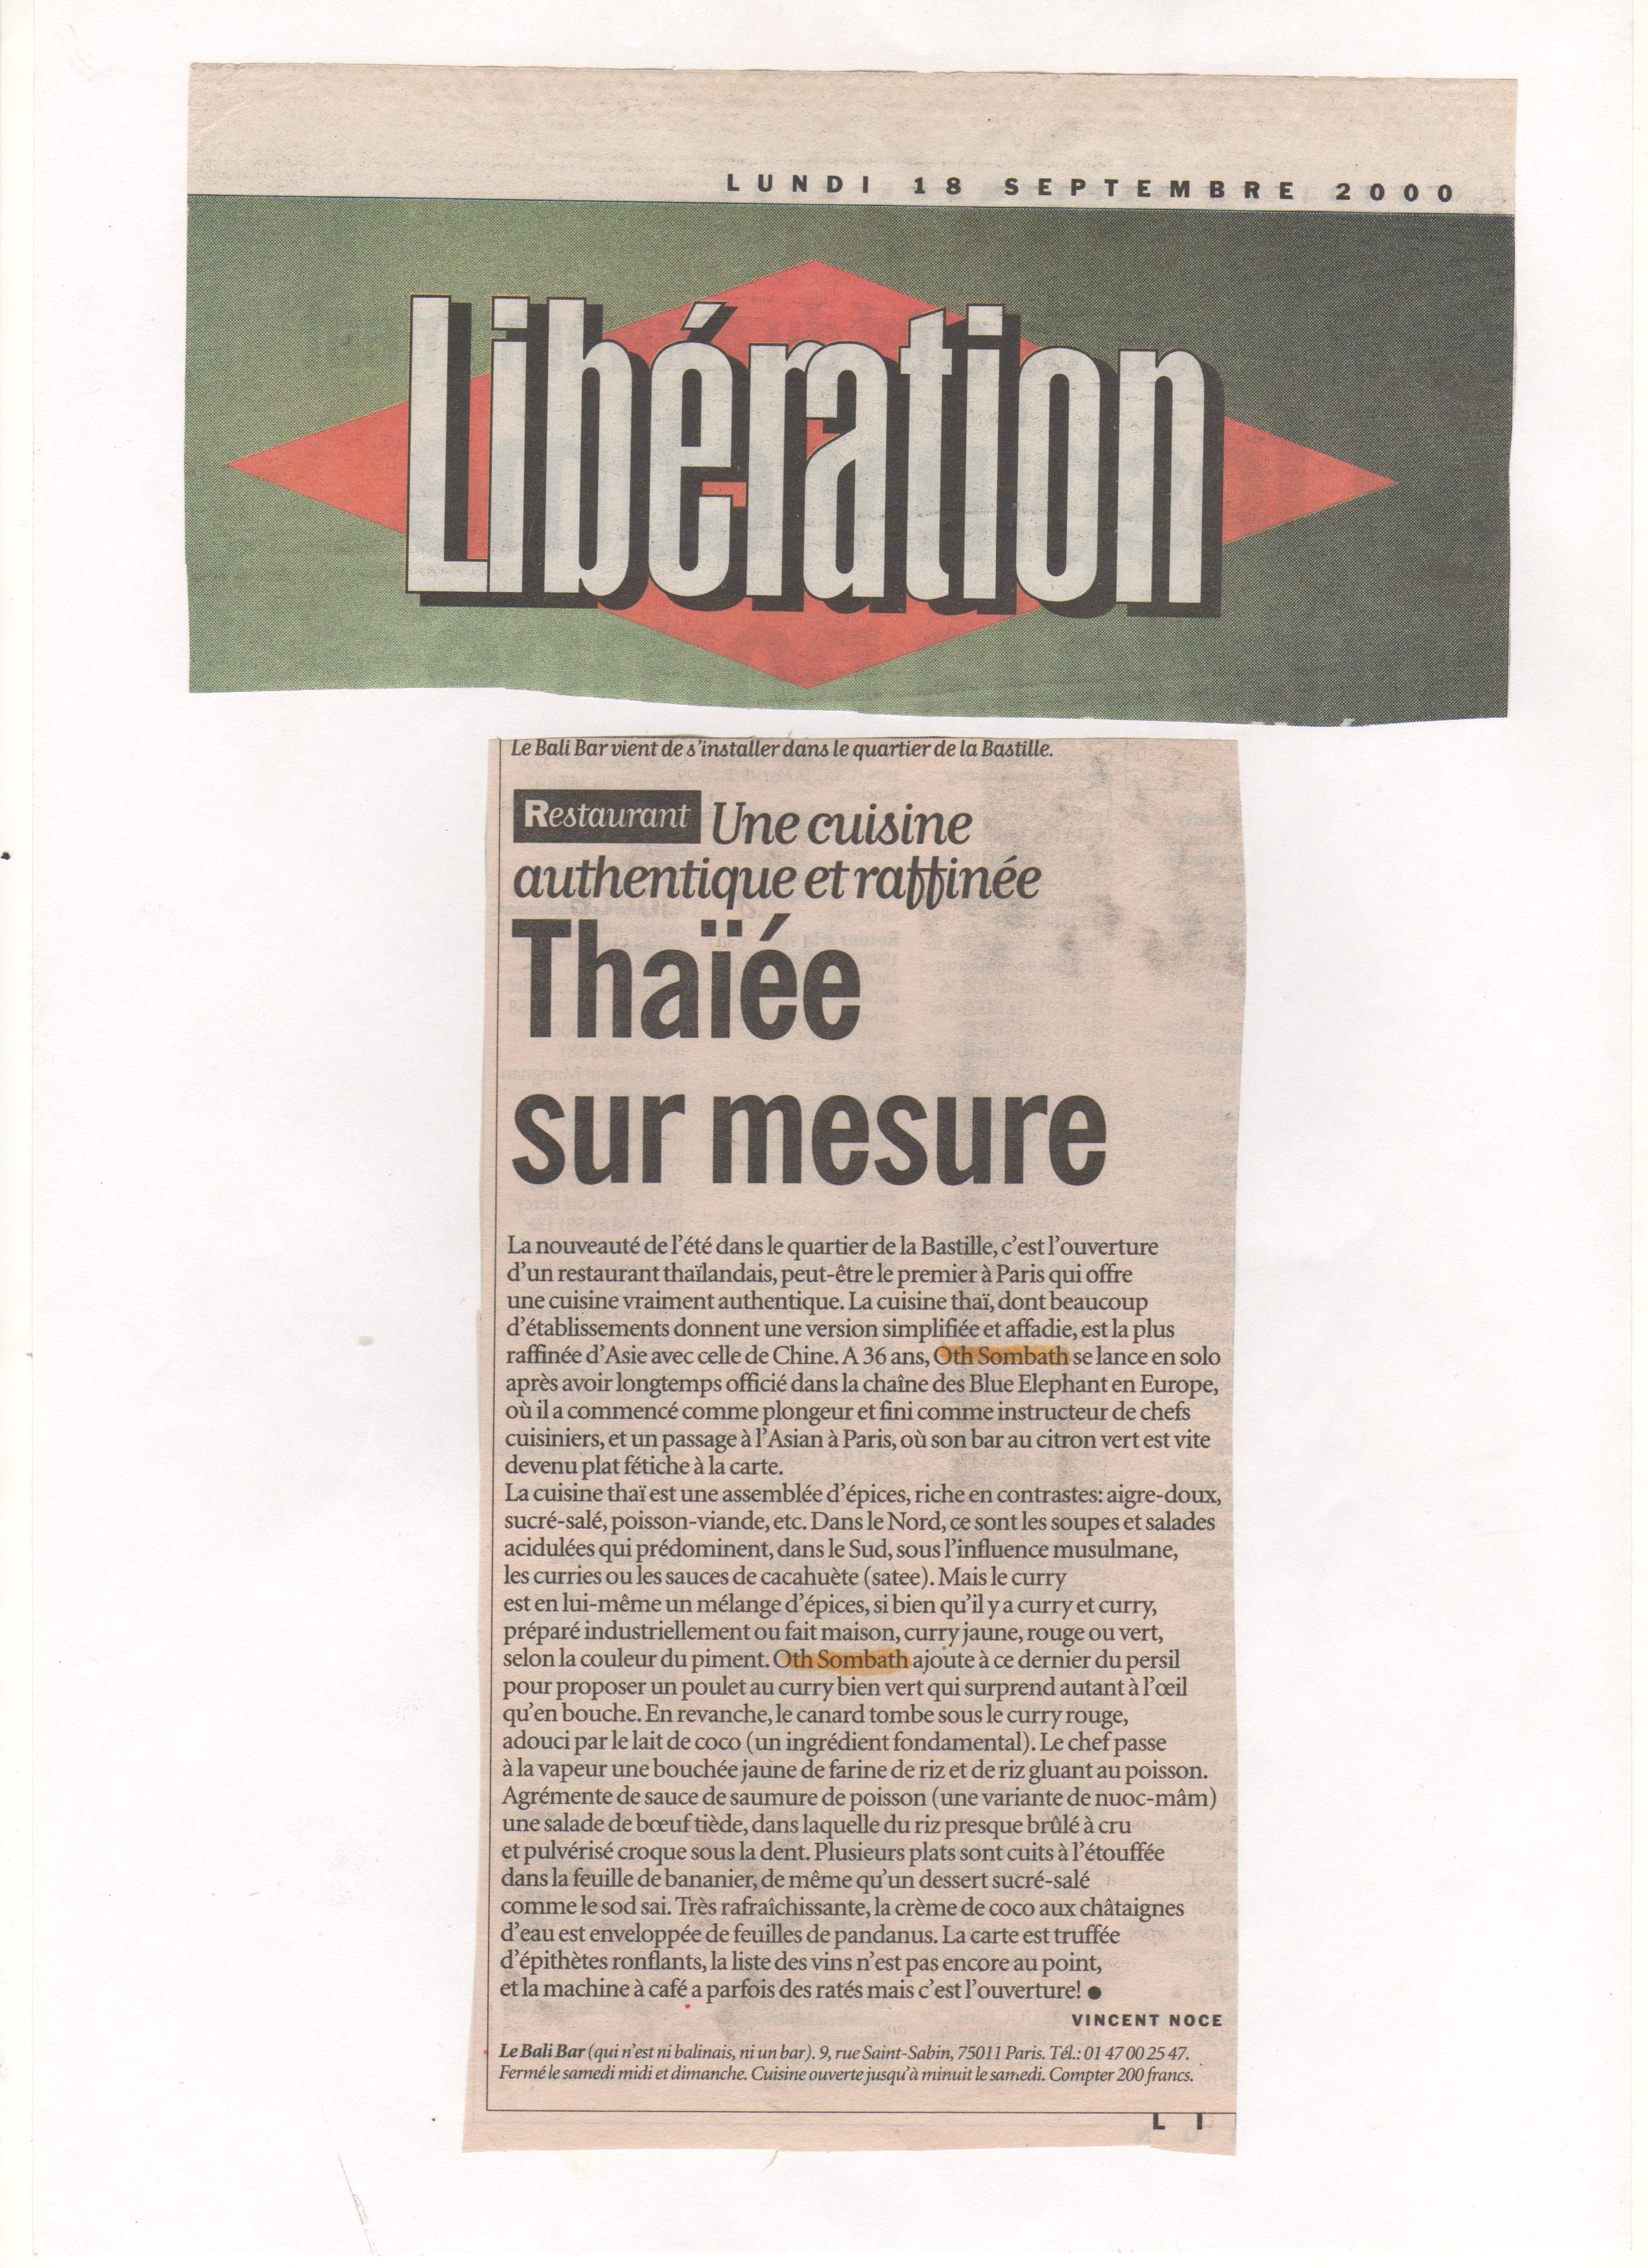 Thaïée sur mesure